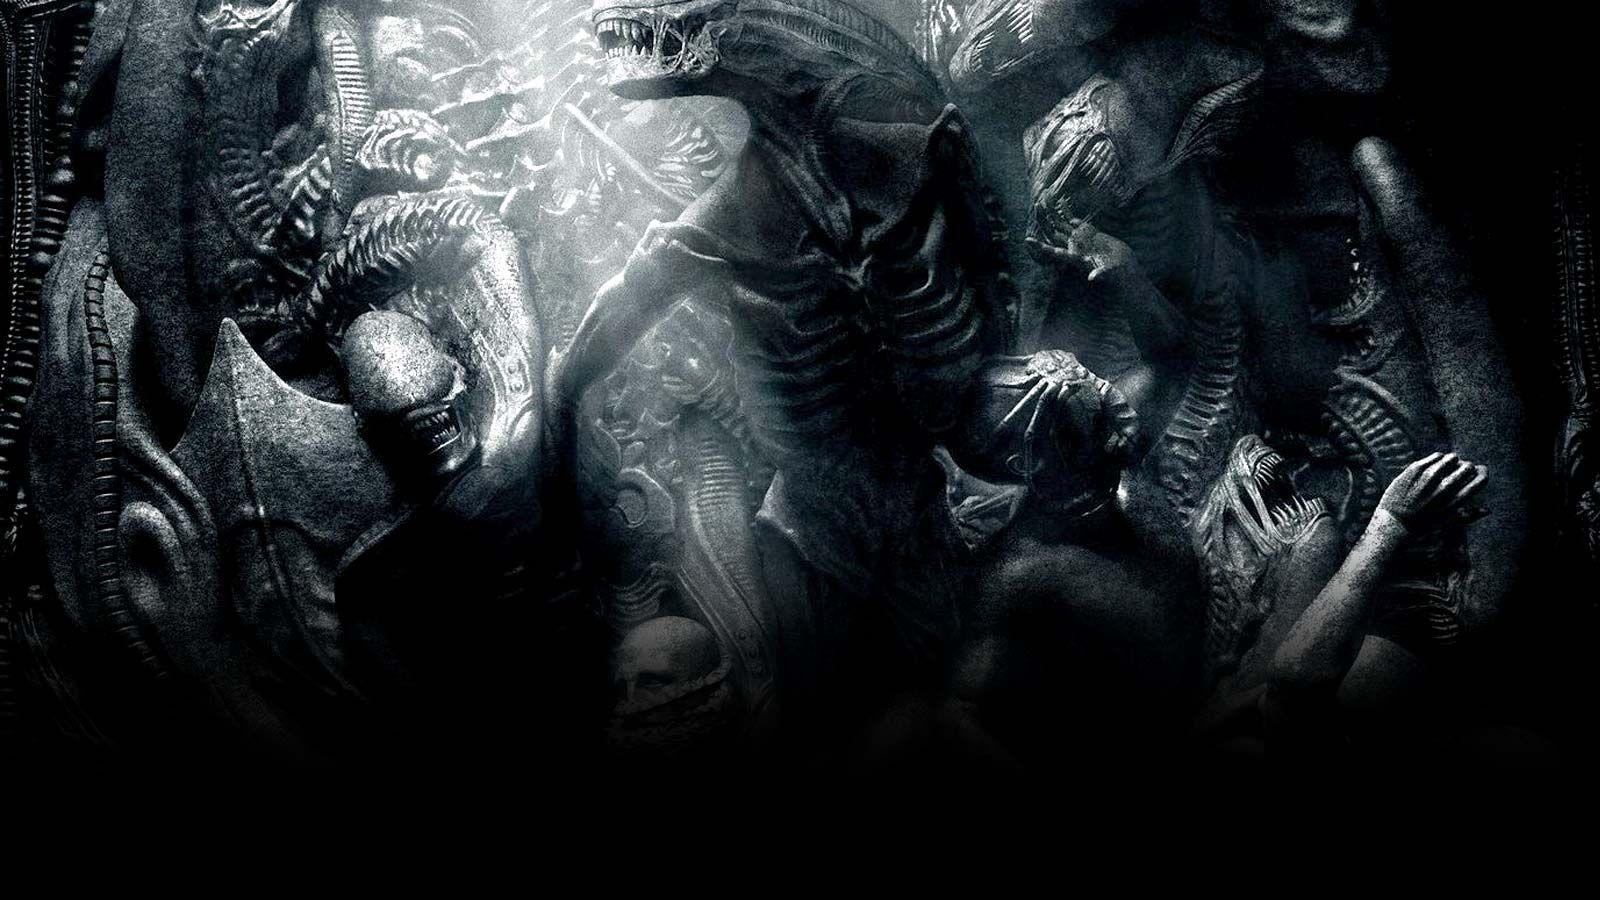 Alien Covenant Online O Descargar Gratis Hd Peliculas De Alien